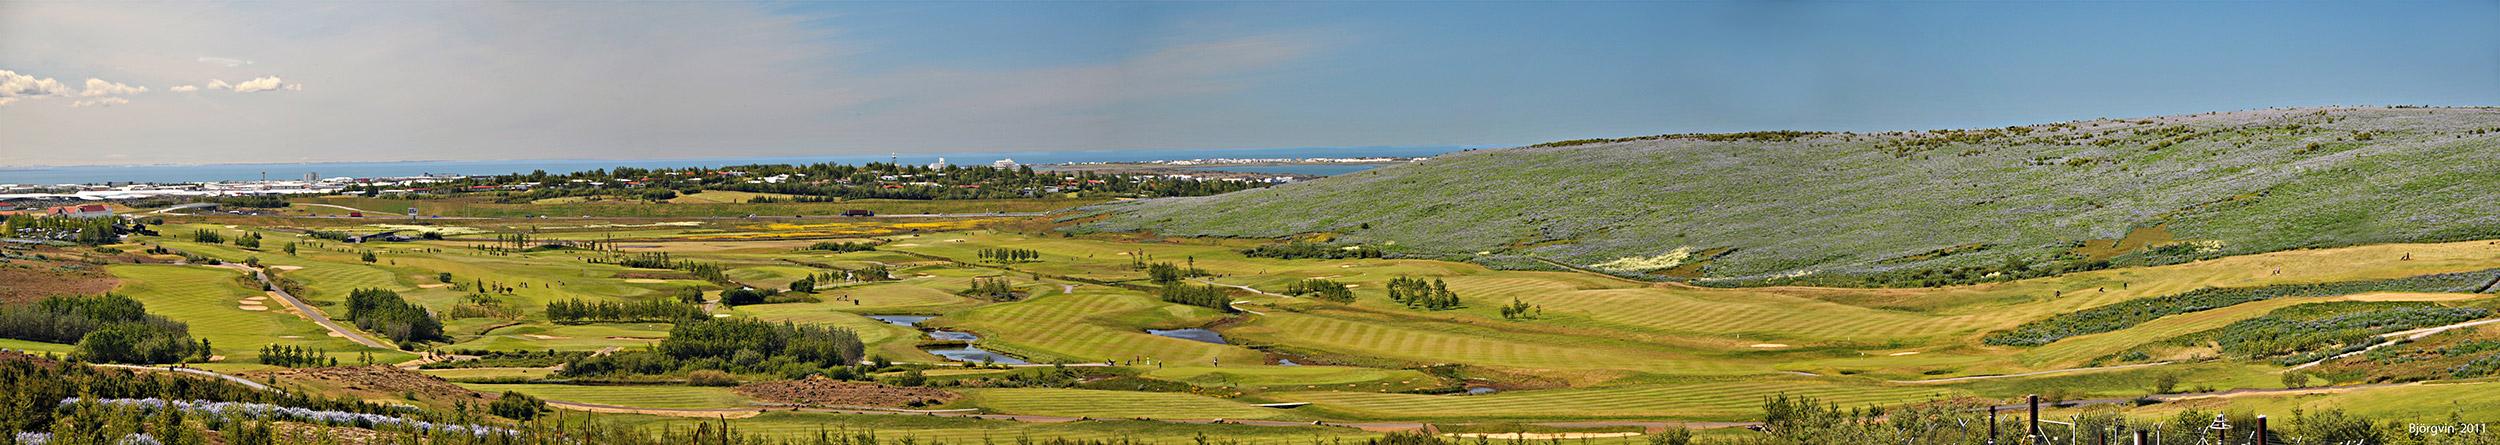 The GKG golf course